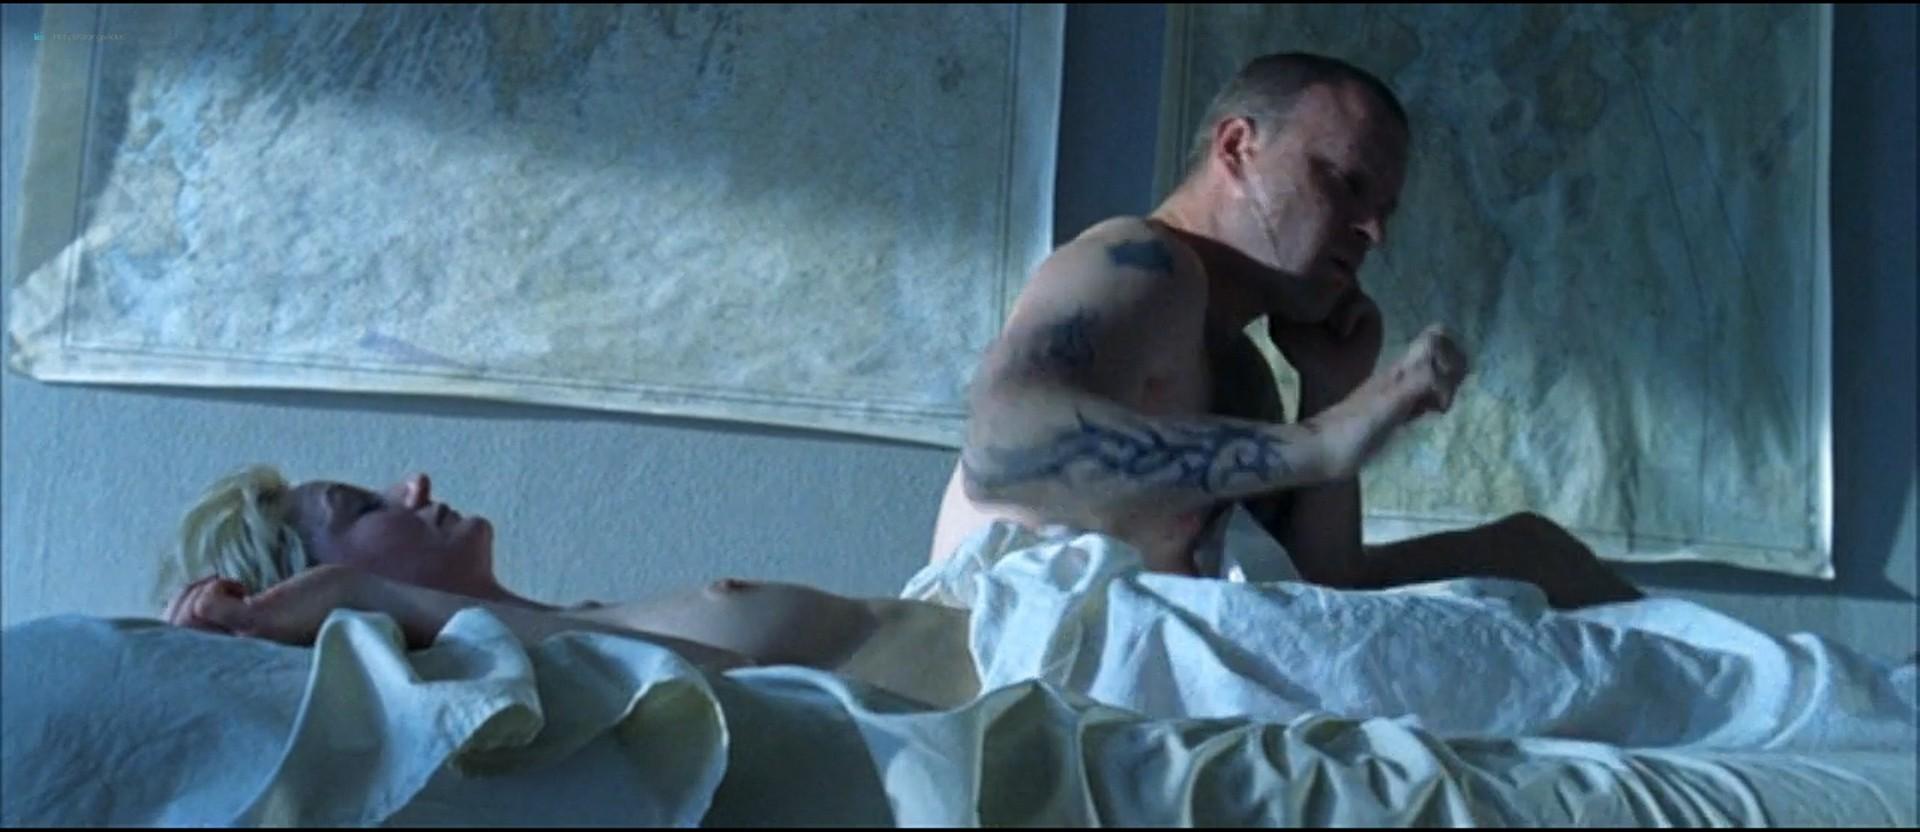 Signe Egholm Olsen nude hot sex Pernille Vallentin nude sex too - Nordkraft (DK-2005) HD 1080p Web (4)